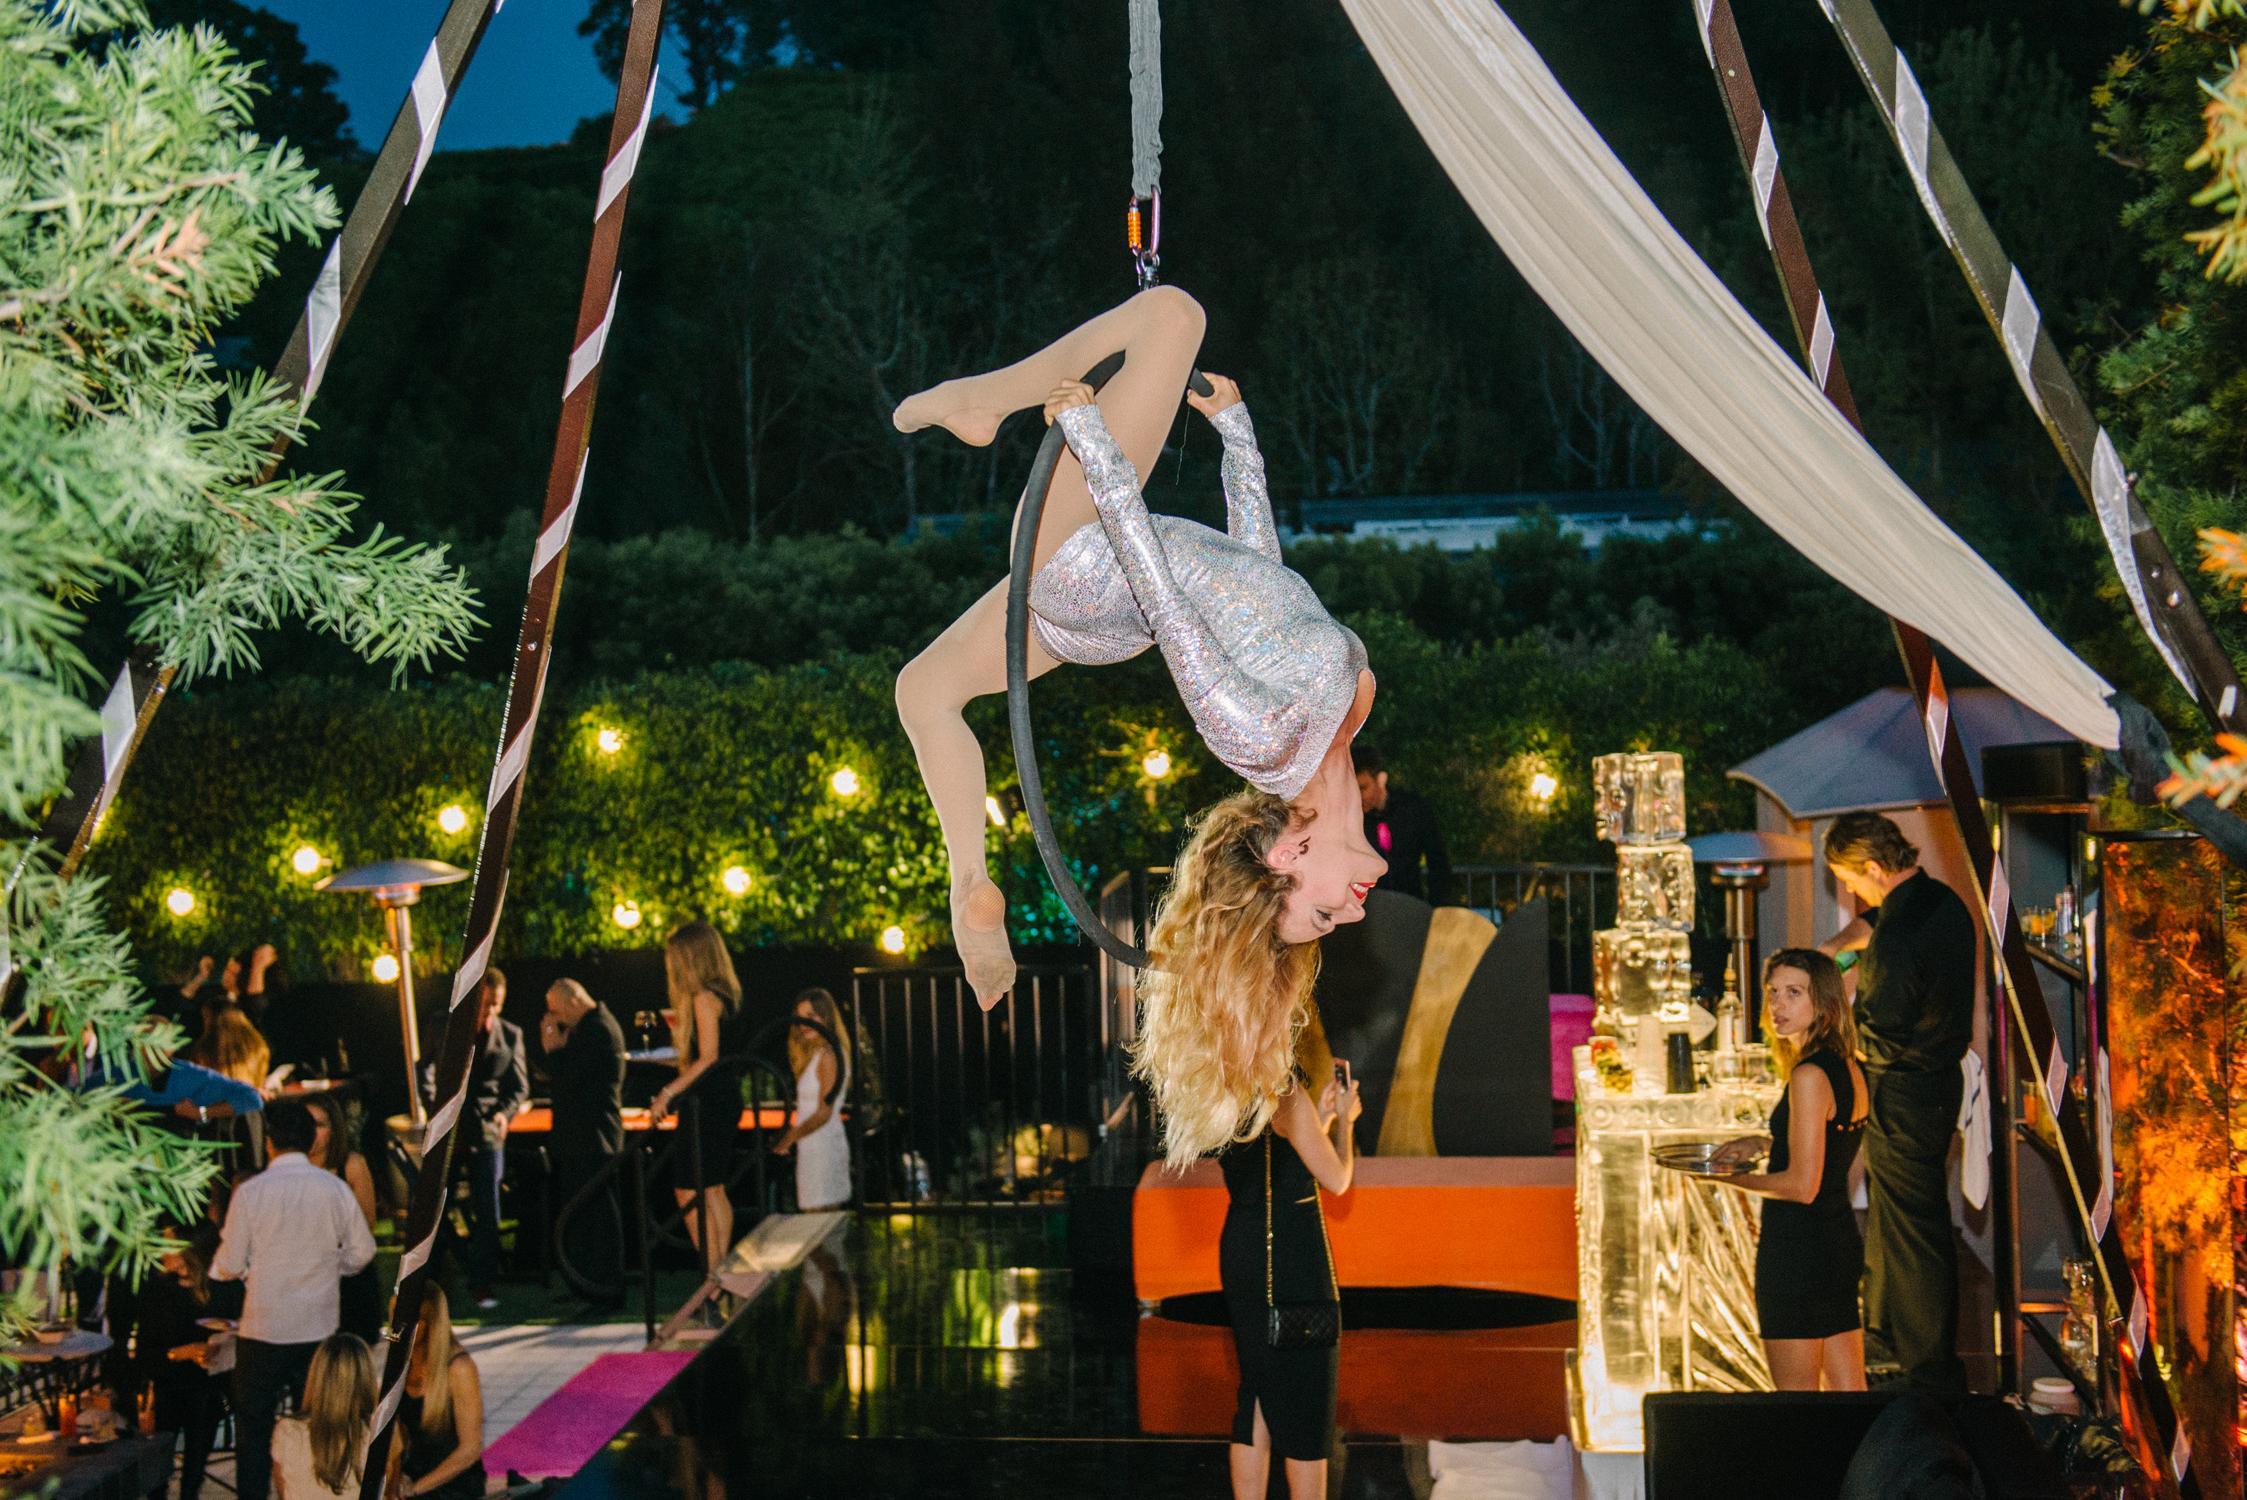 tarynco-events-vegas-casino-night-entertainment.jpg